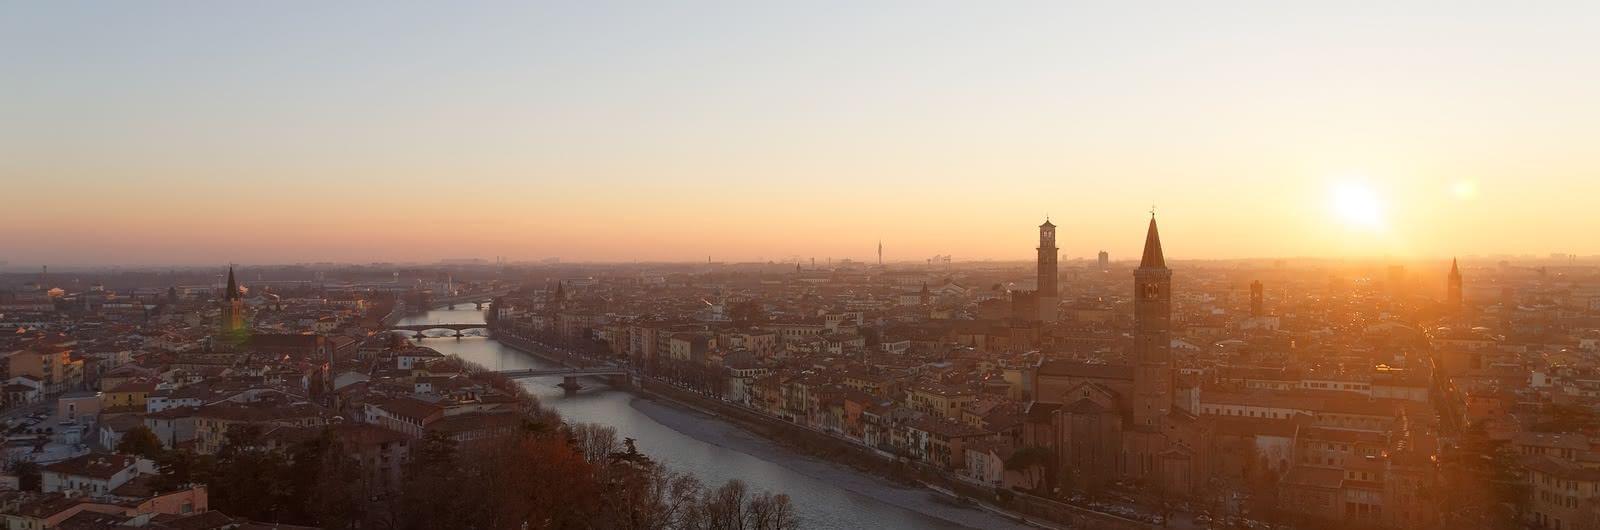 verona city header